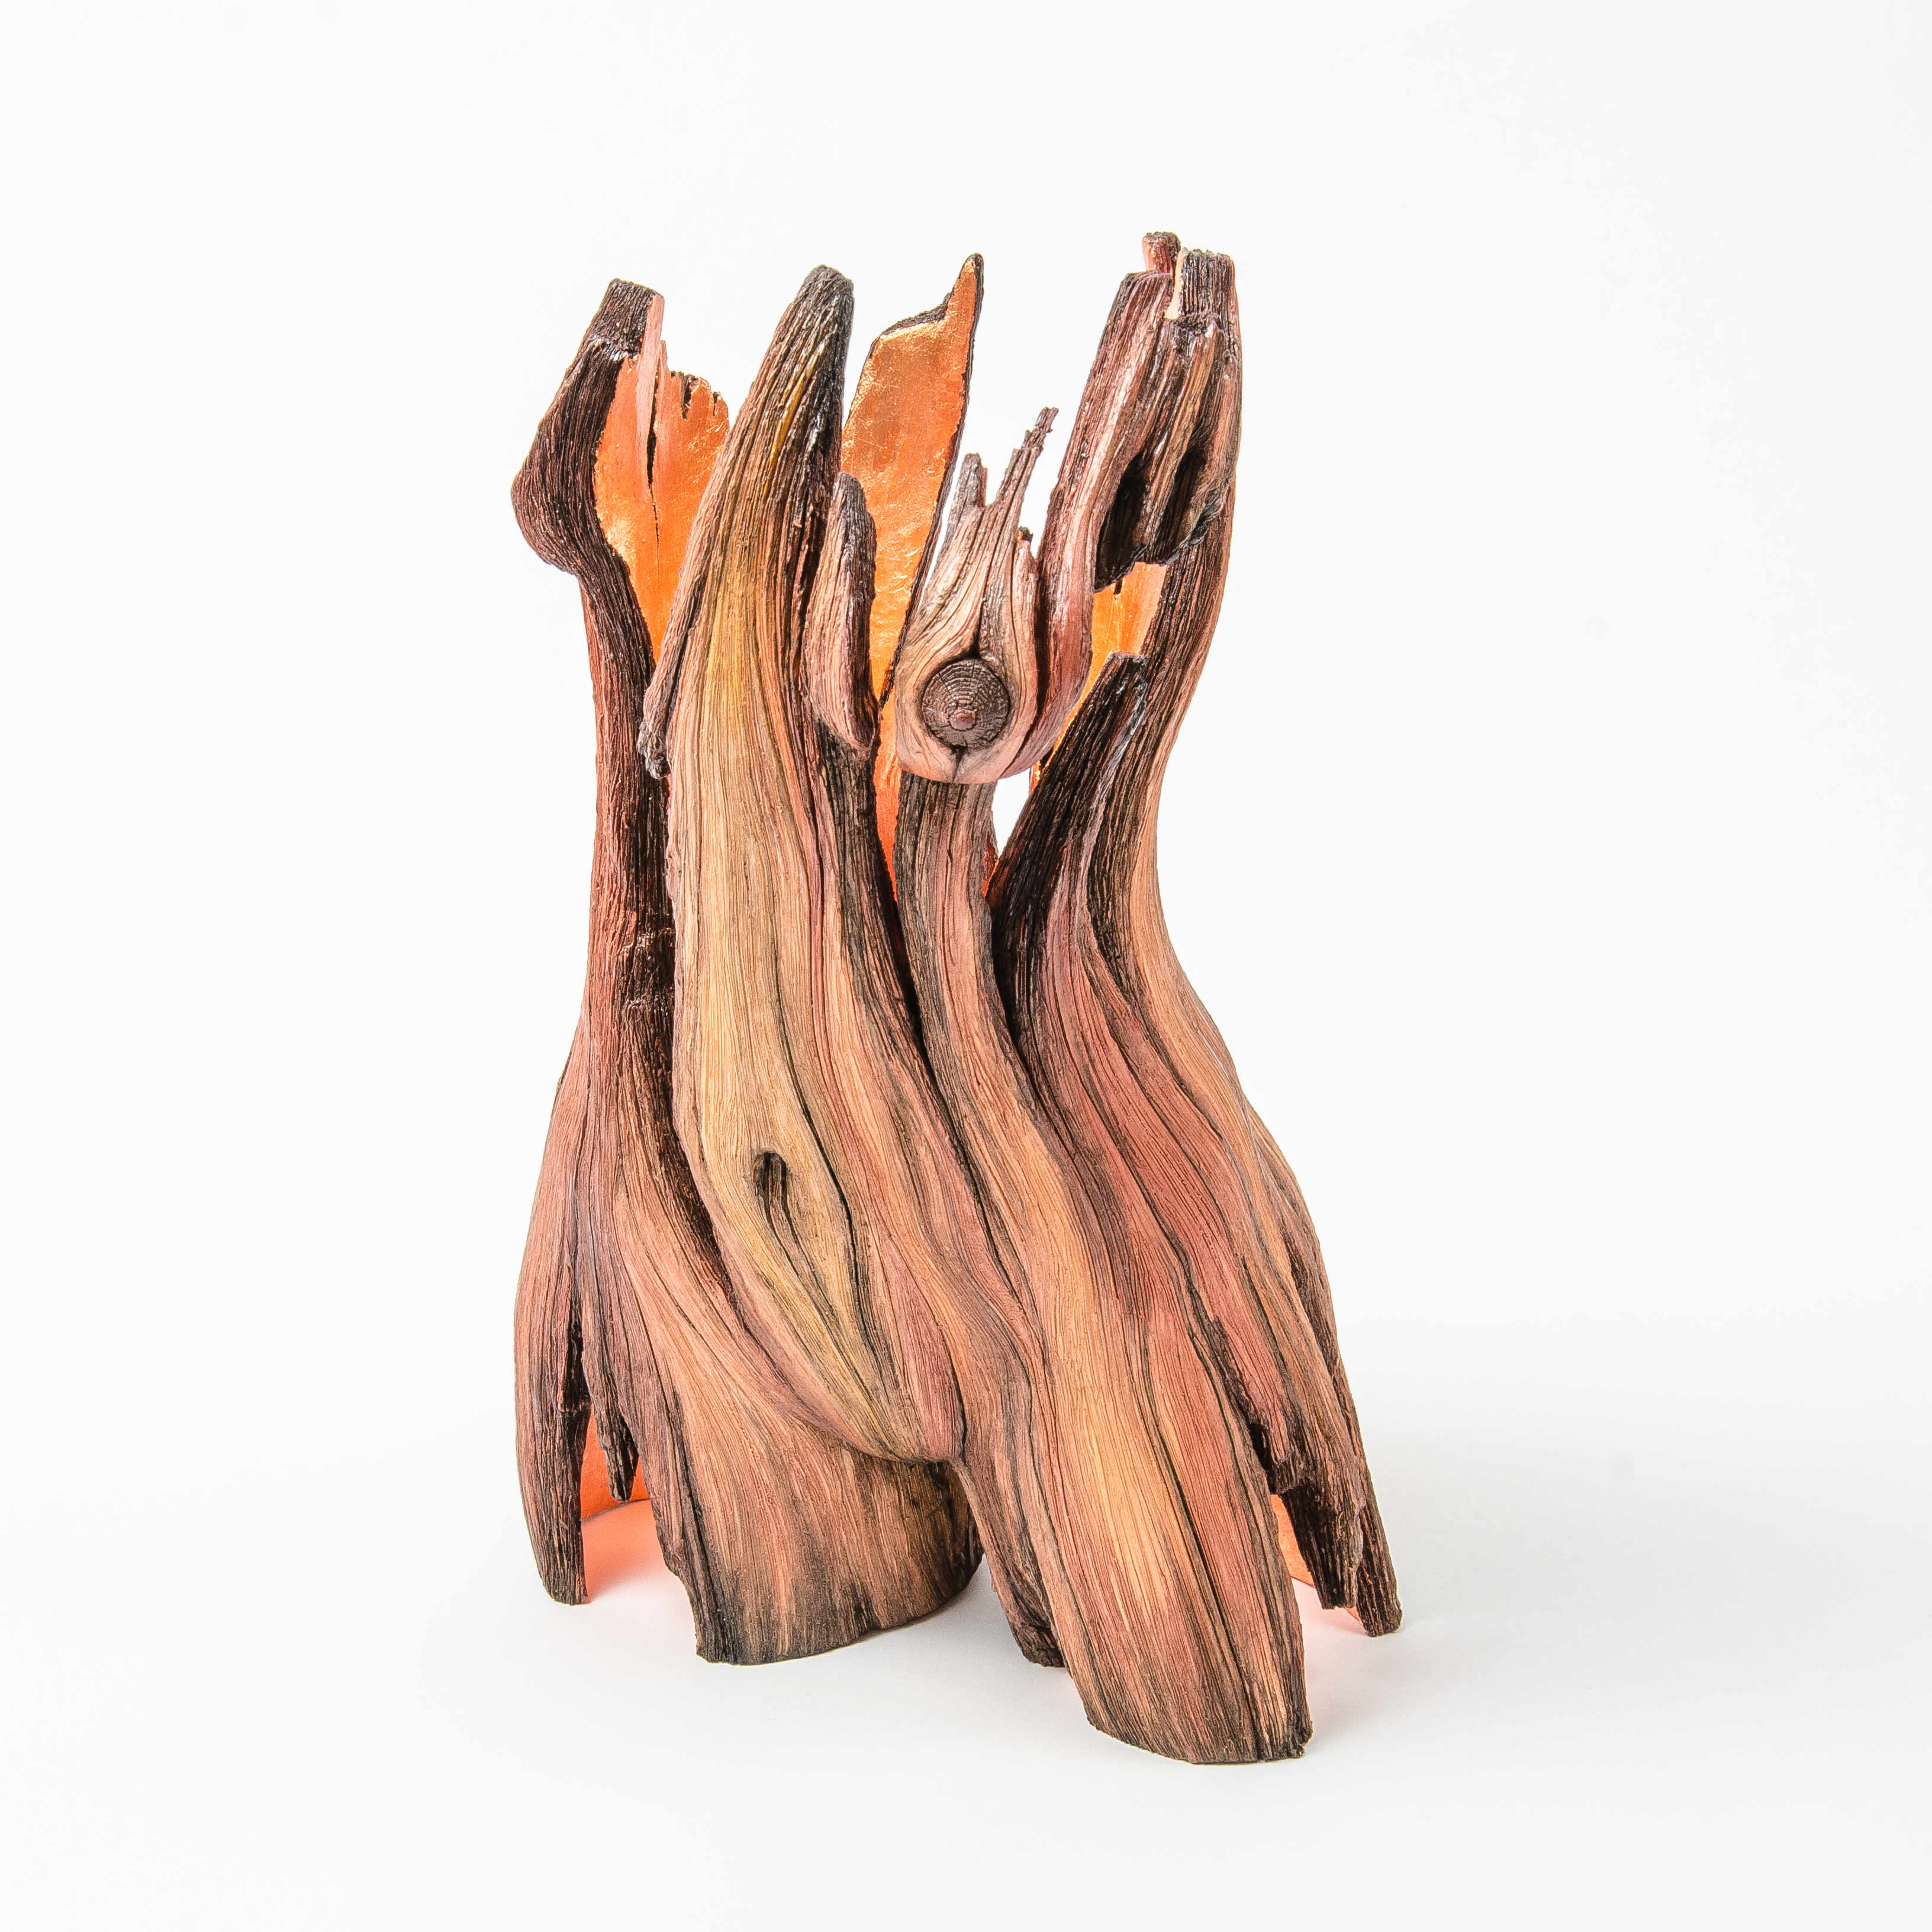 Ceramic sculpture by Christopher David White